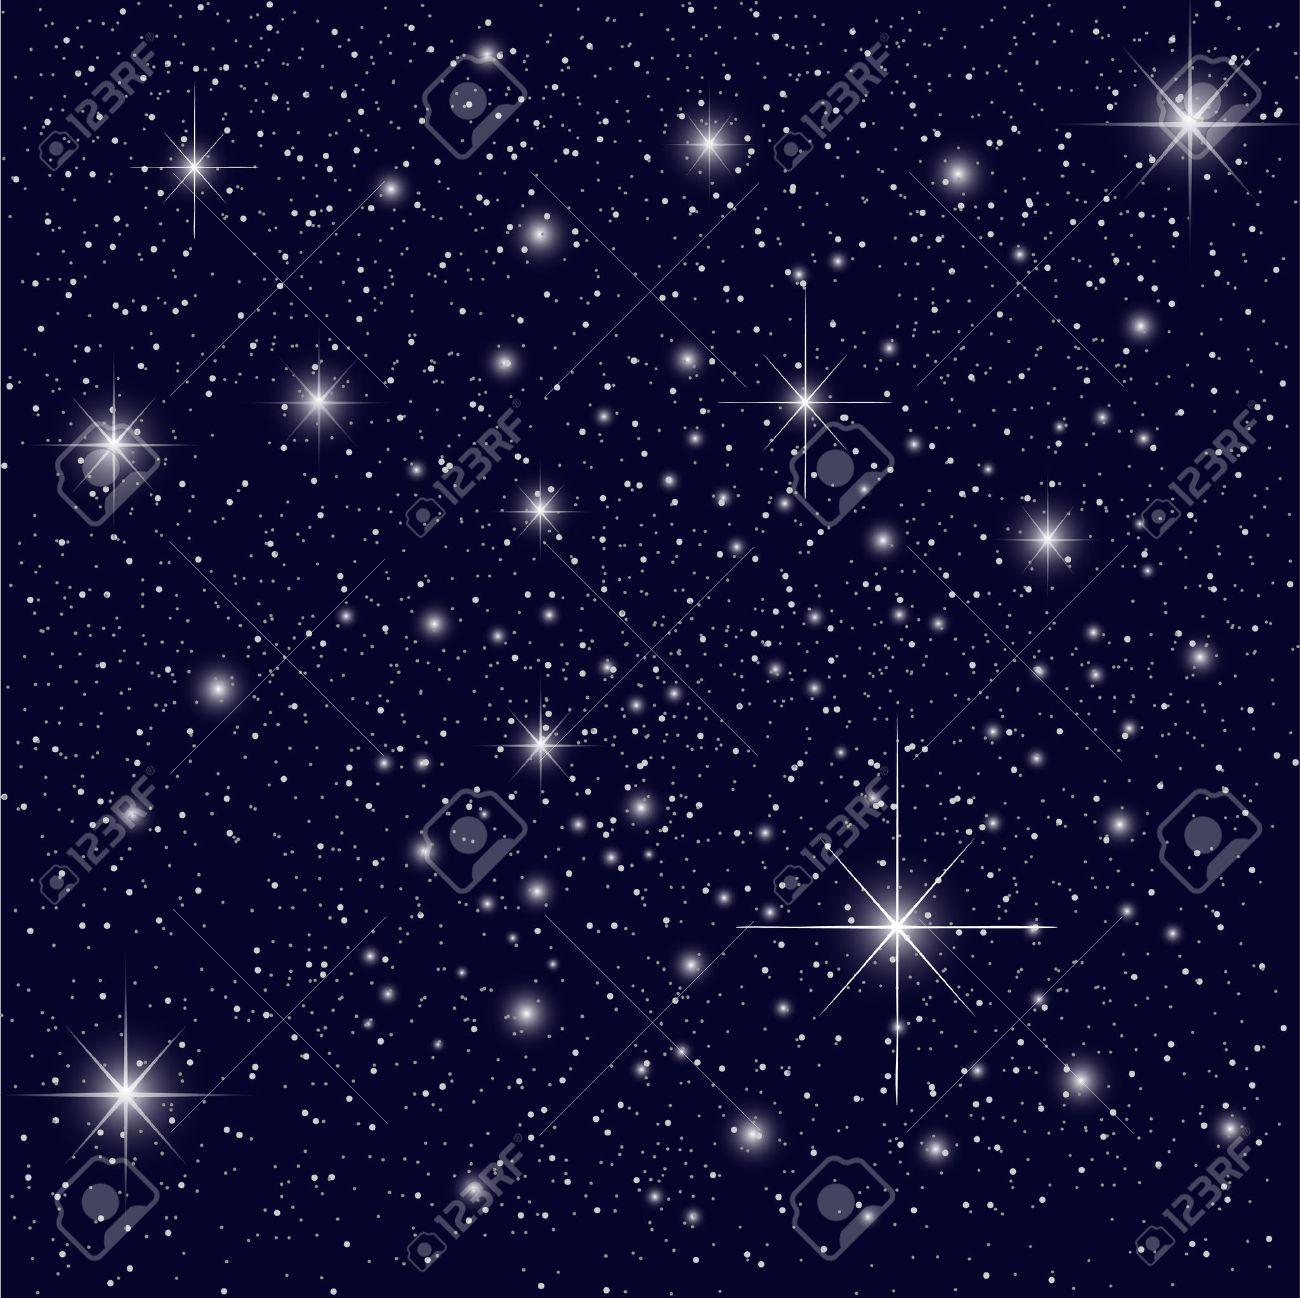 Night Sky with Stars Stock Vector - 3283129